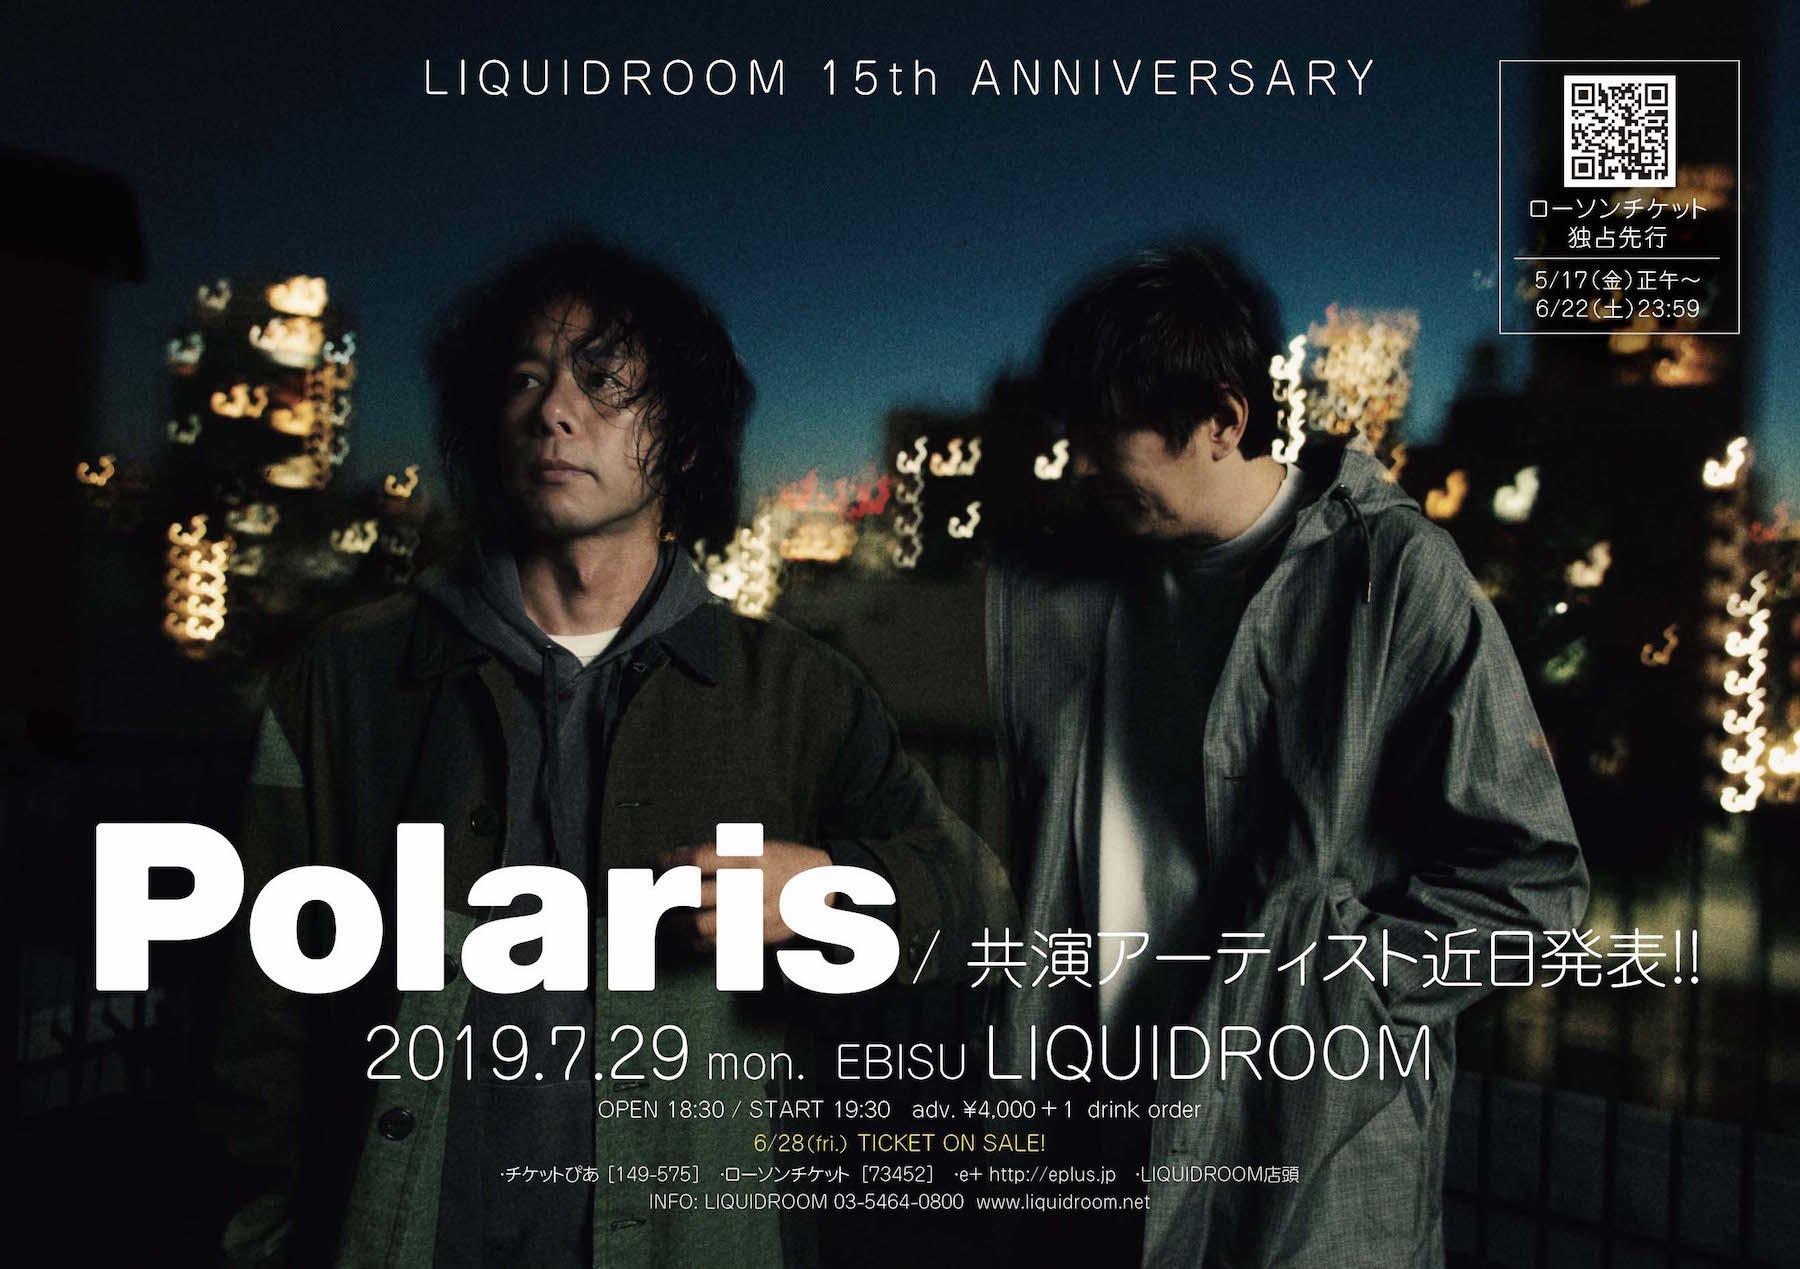 Polaris / 対バンあり